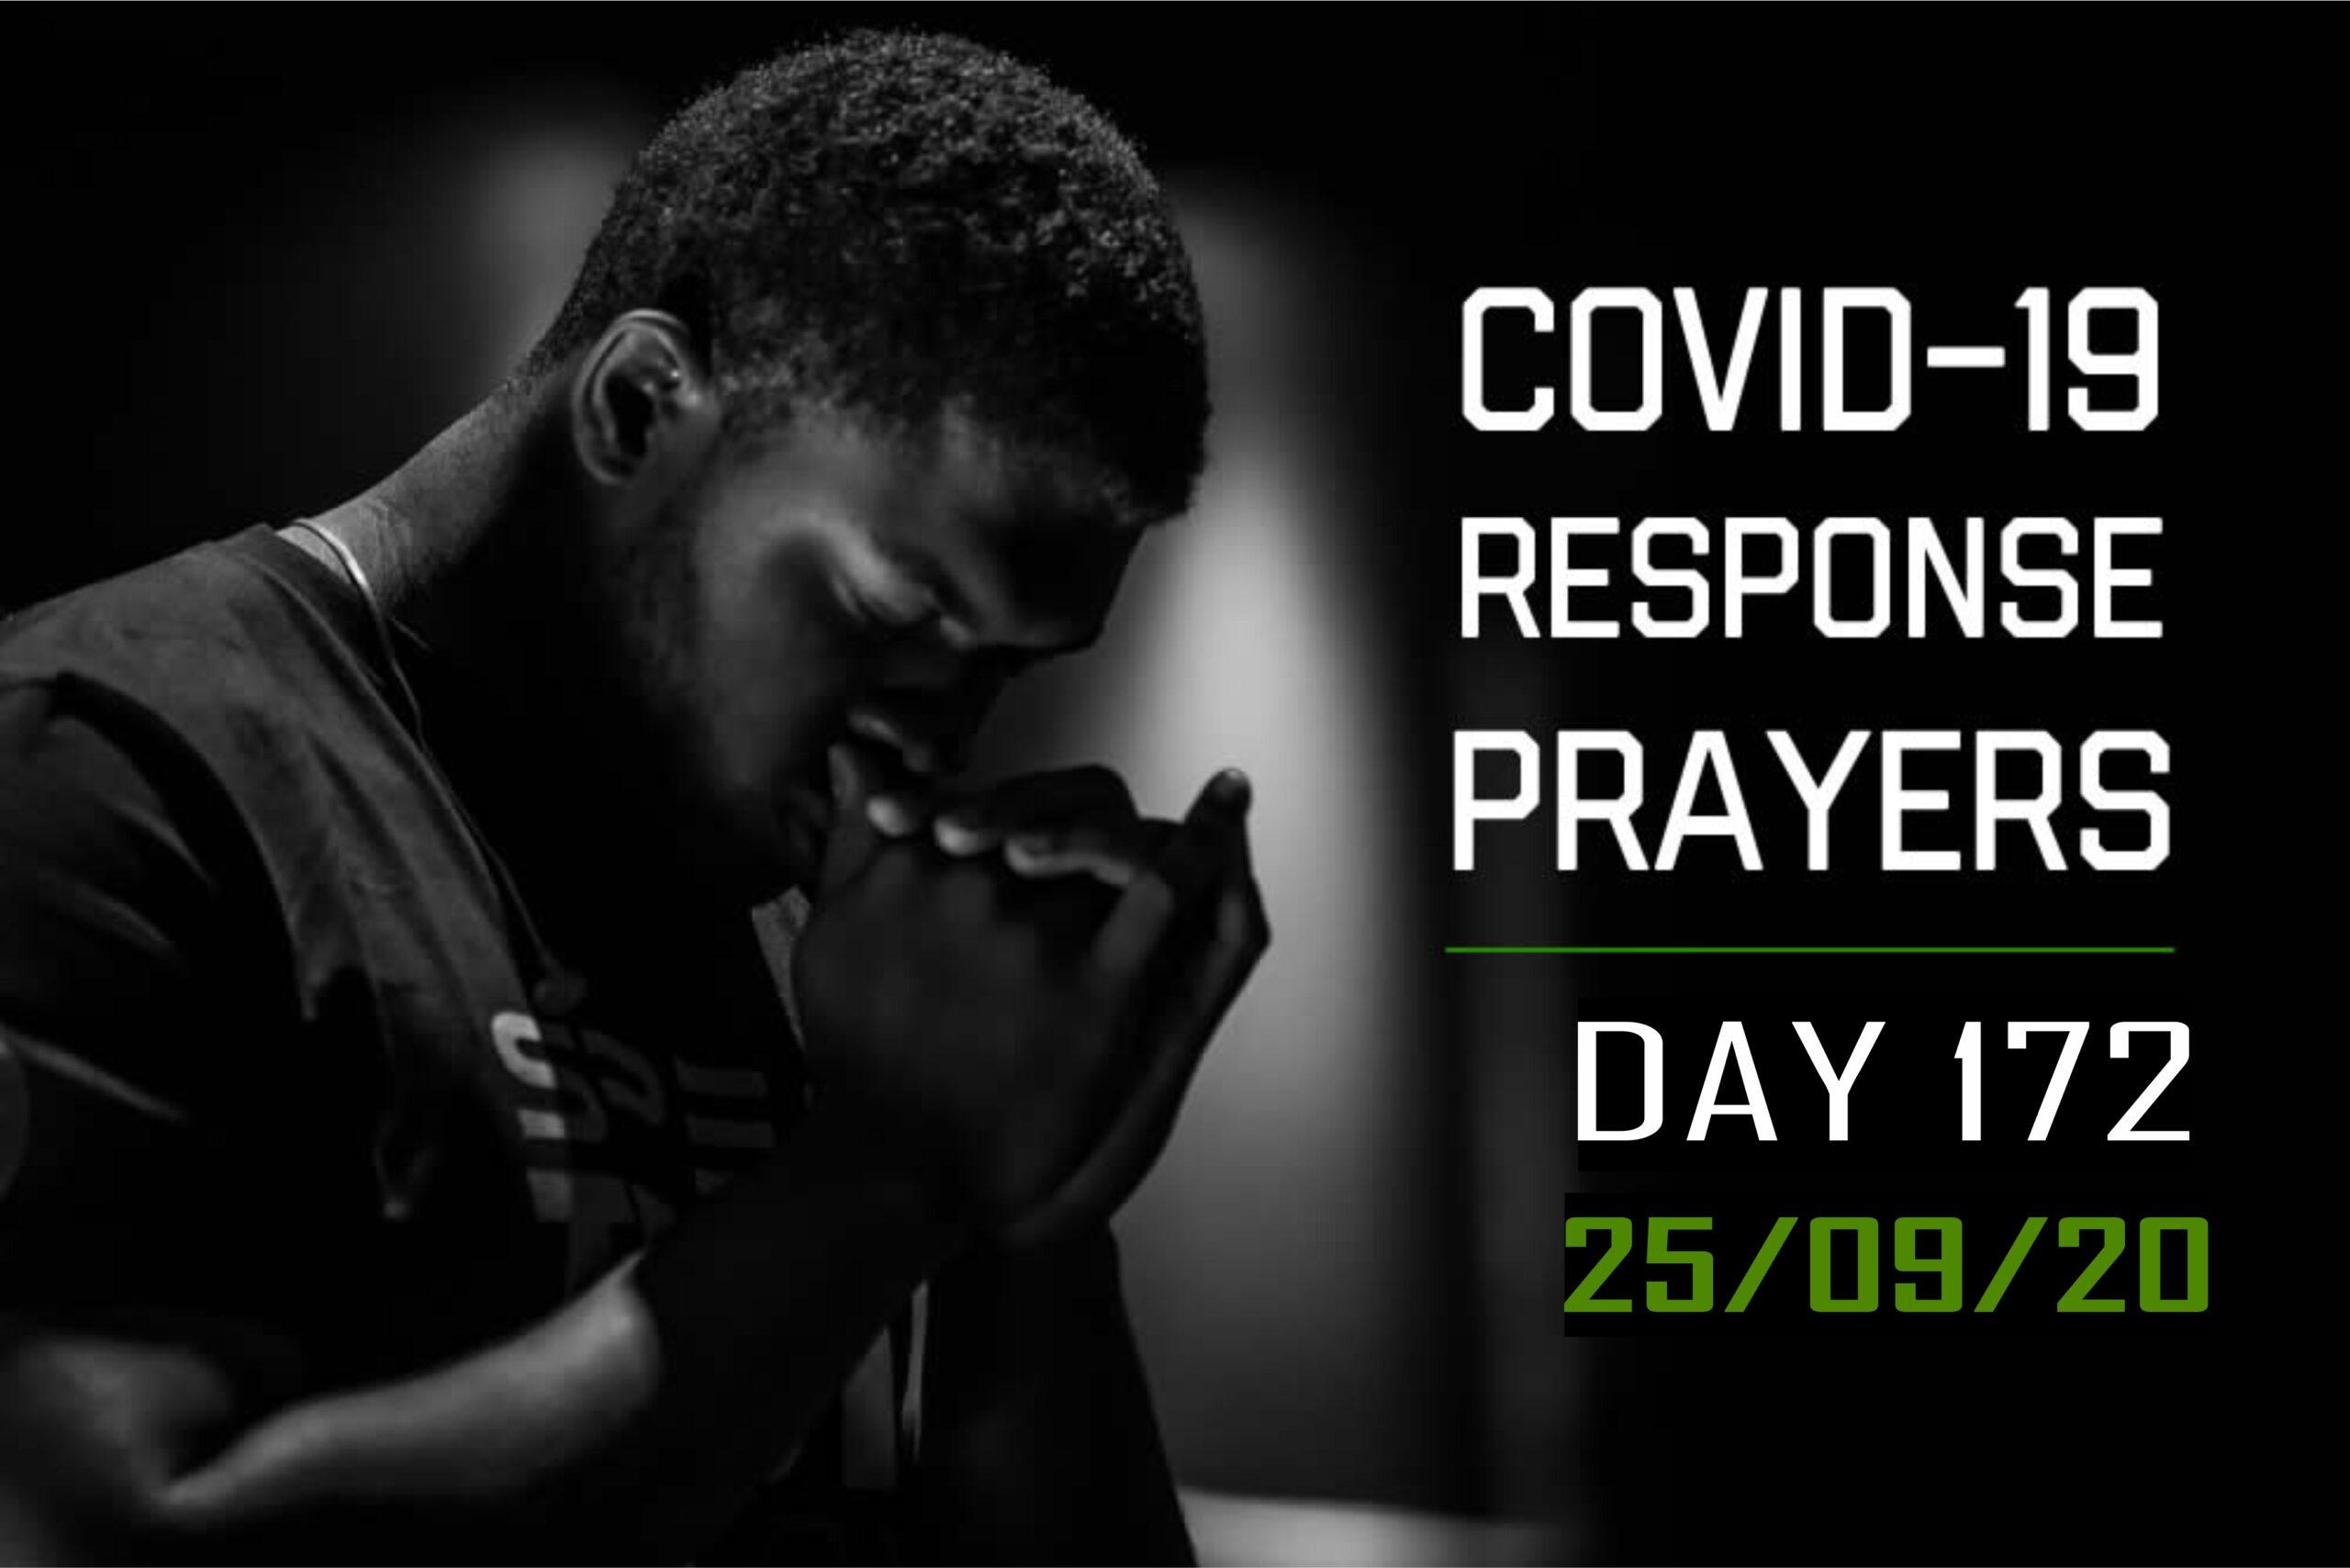 COVID-19 Response Prayers Day – 172